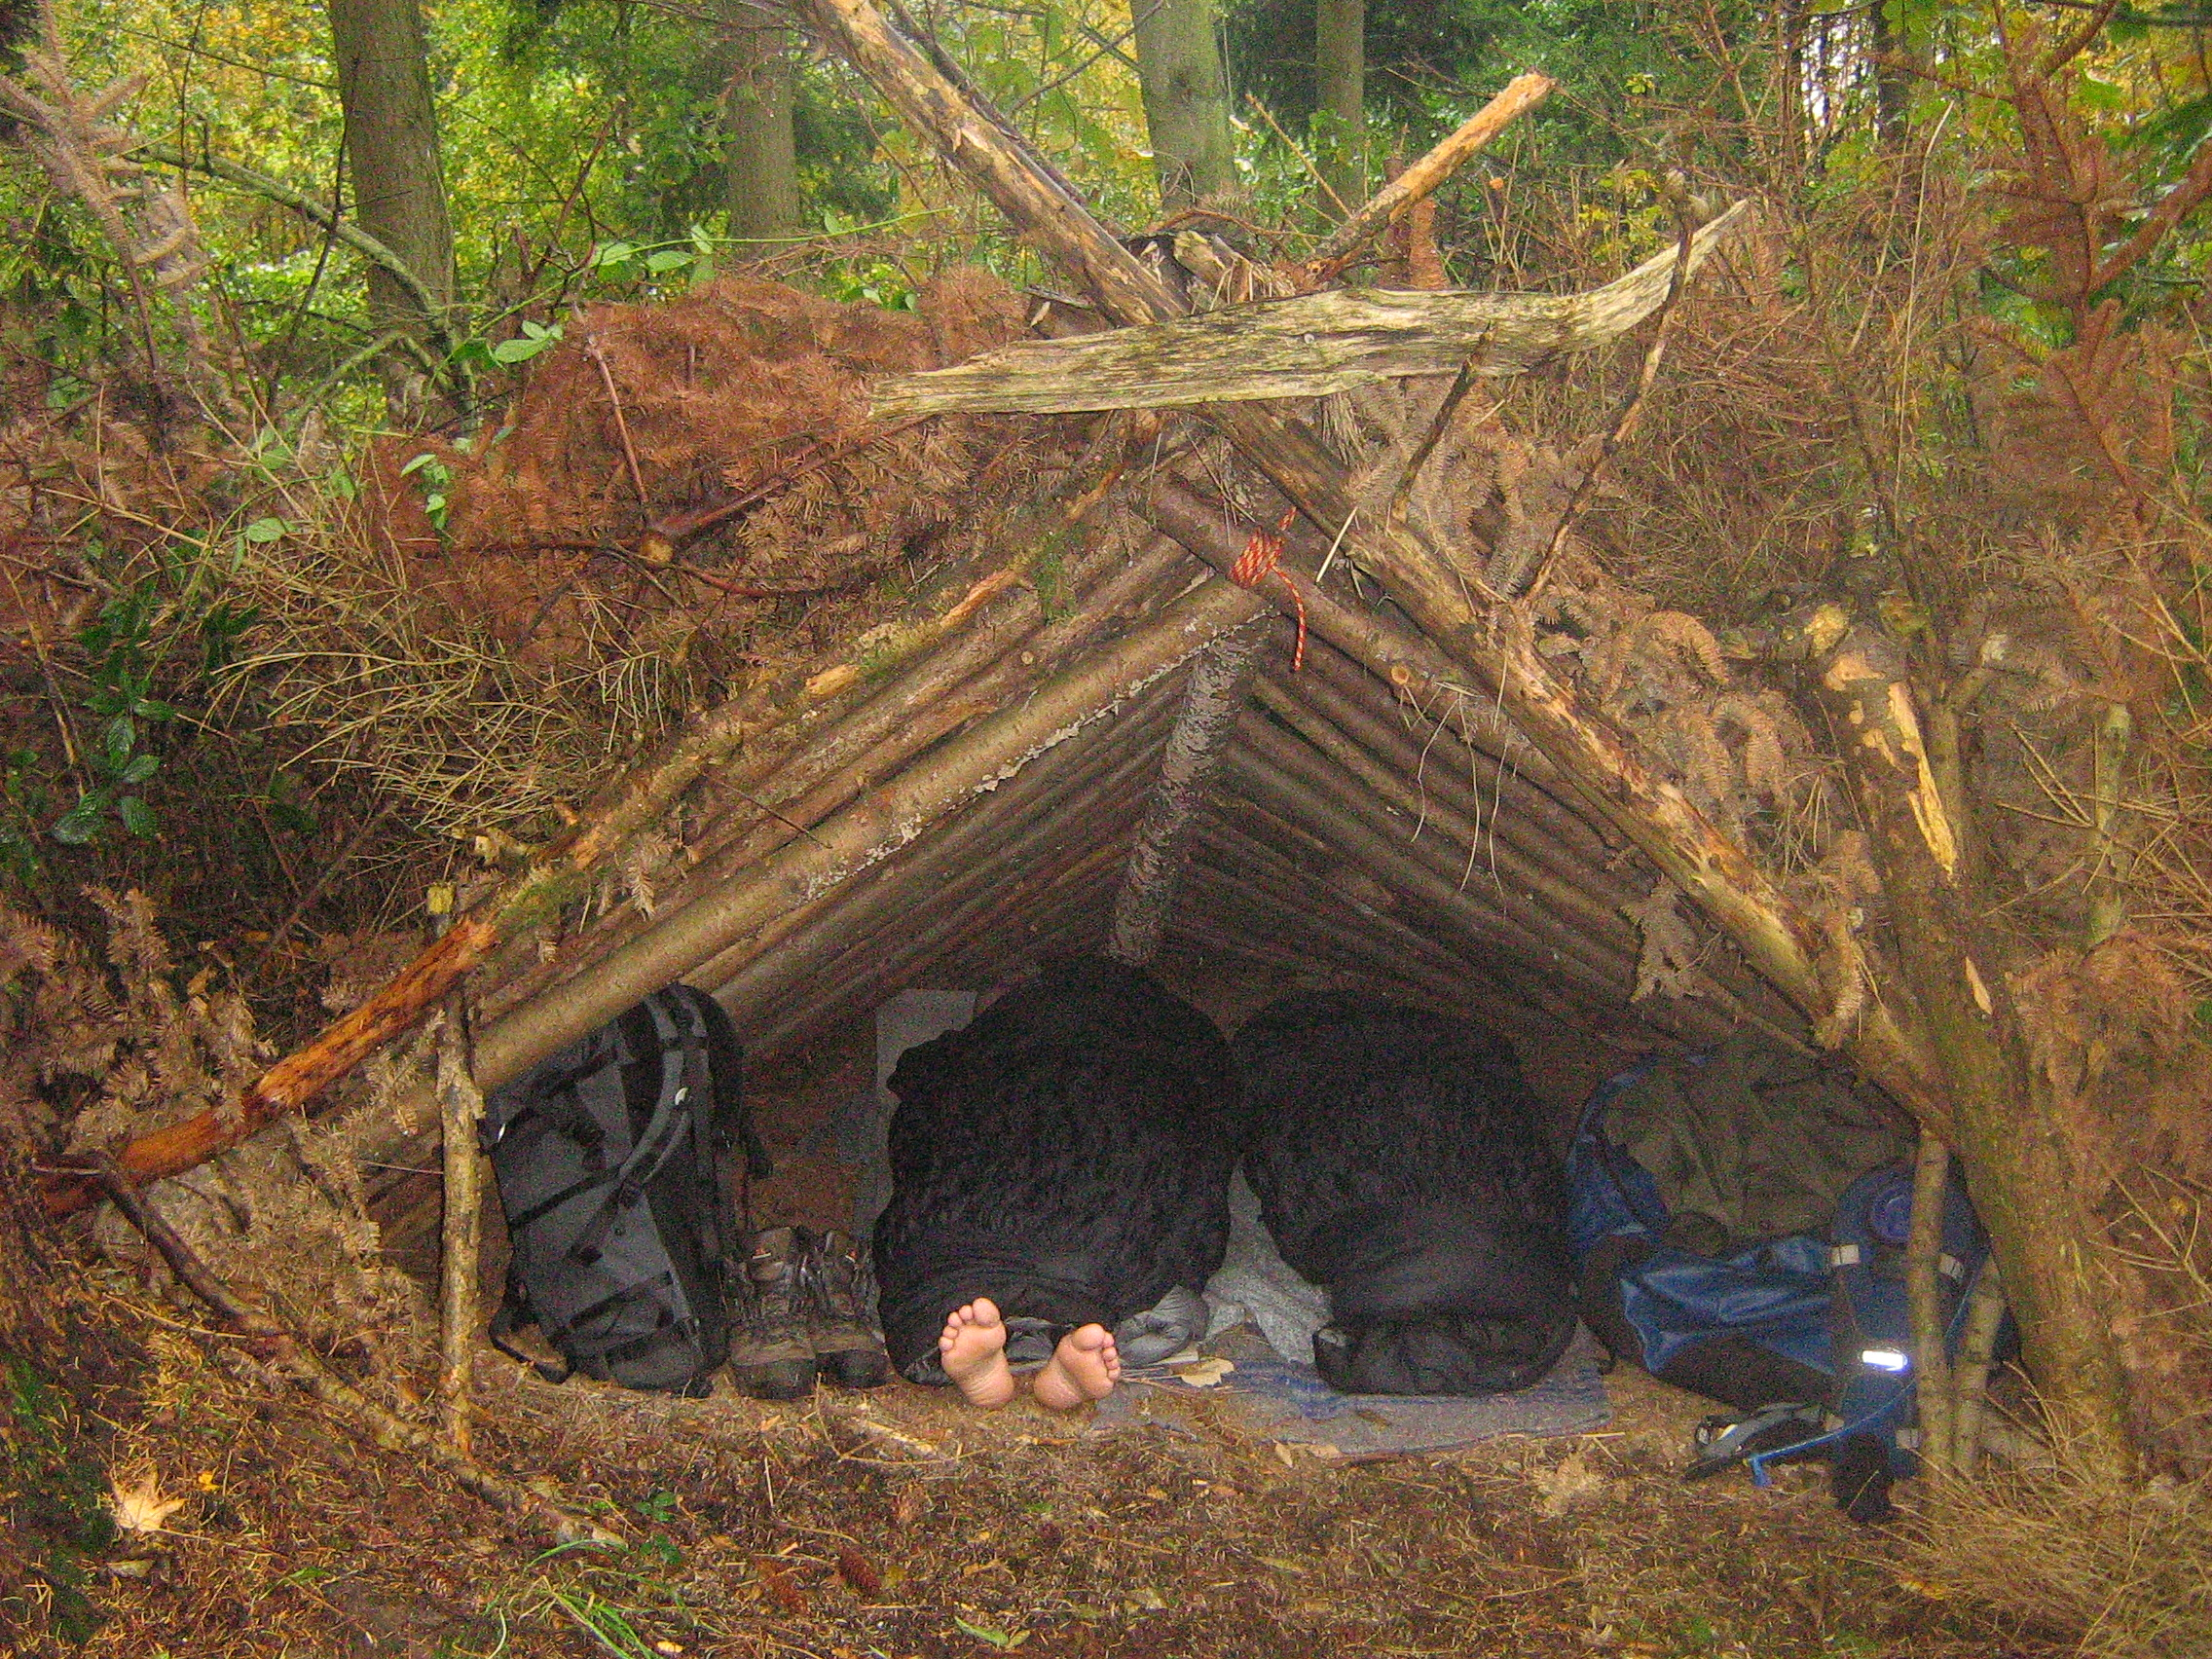 Permanent shelter vaerude.dk